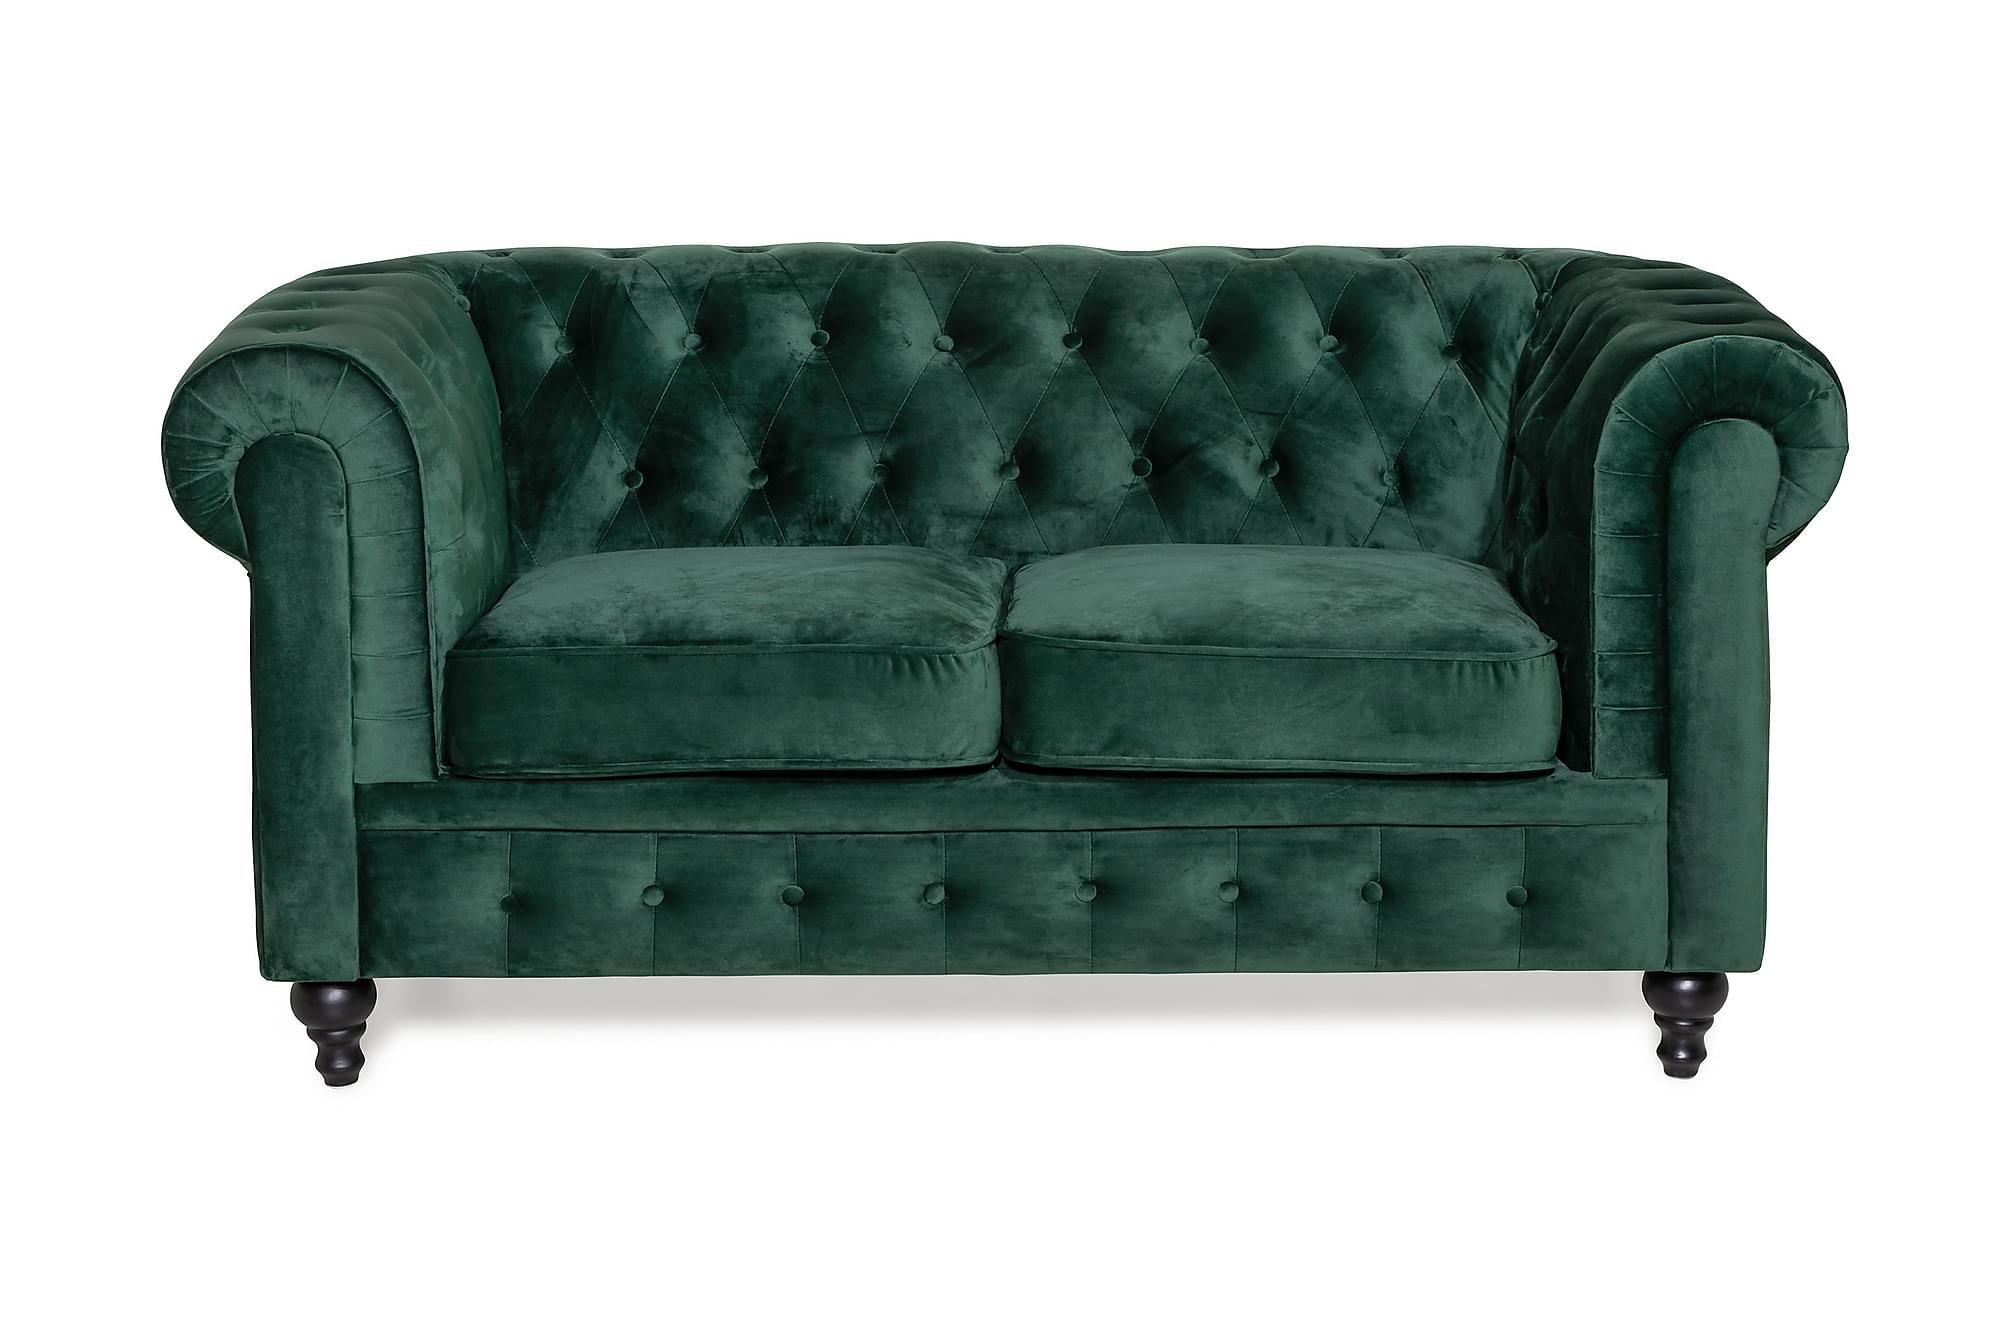 Chesterfield sammetssoffa 2-sits mörkgrön